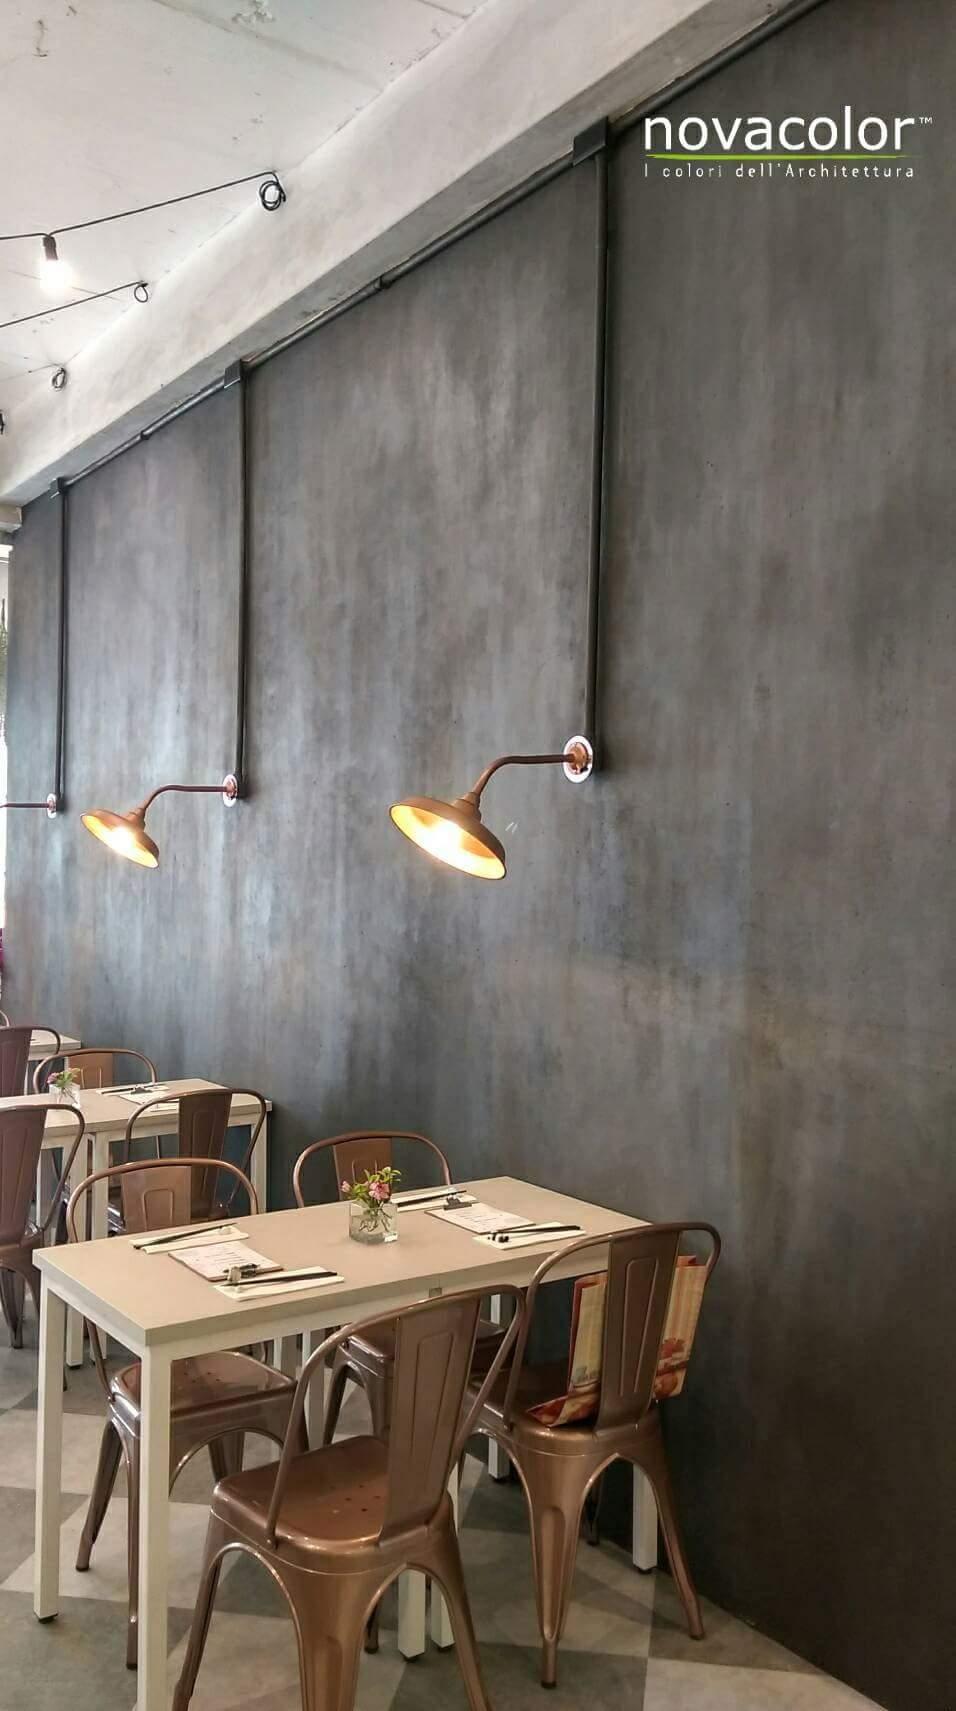 Novacolor Archi+ Concrete sisustuslaasti, ravintola, kahvila